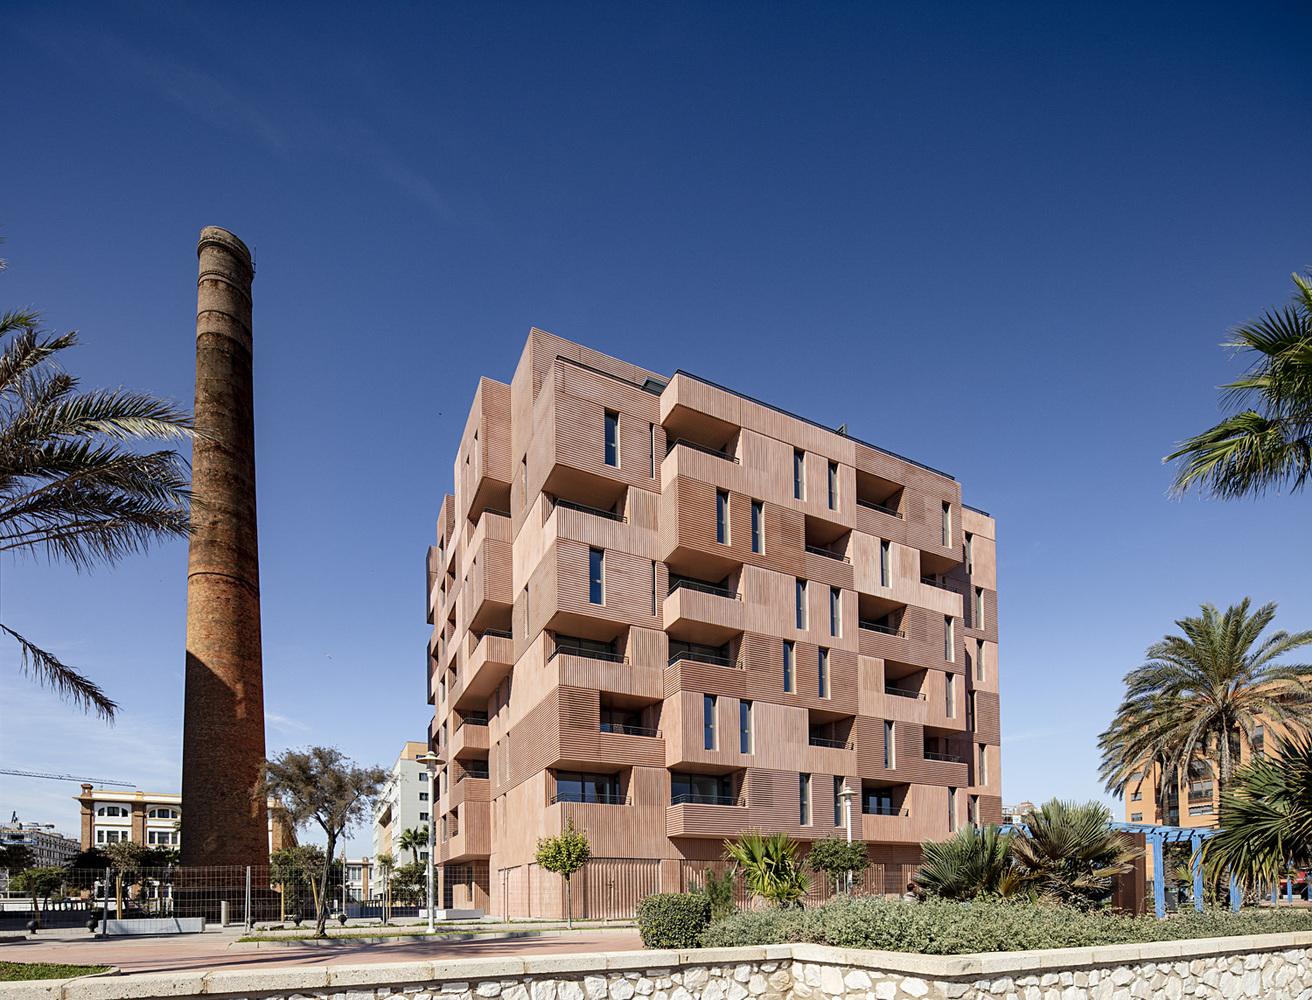 Building of 73 Apartments / Muñoz Miranda Architects